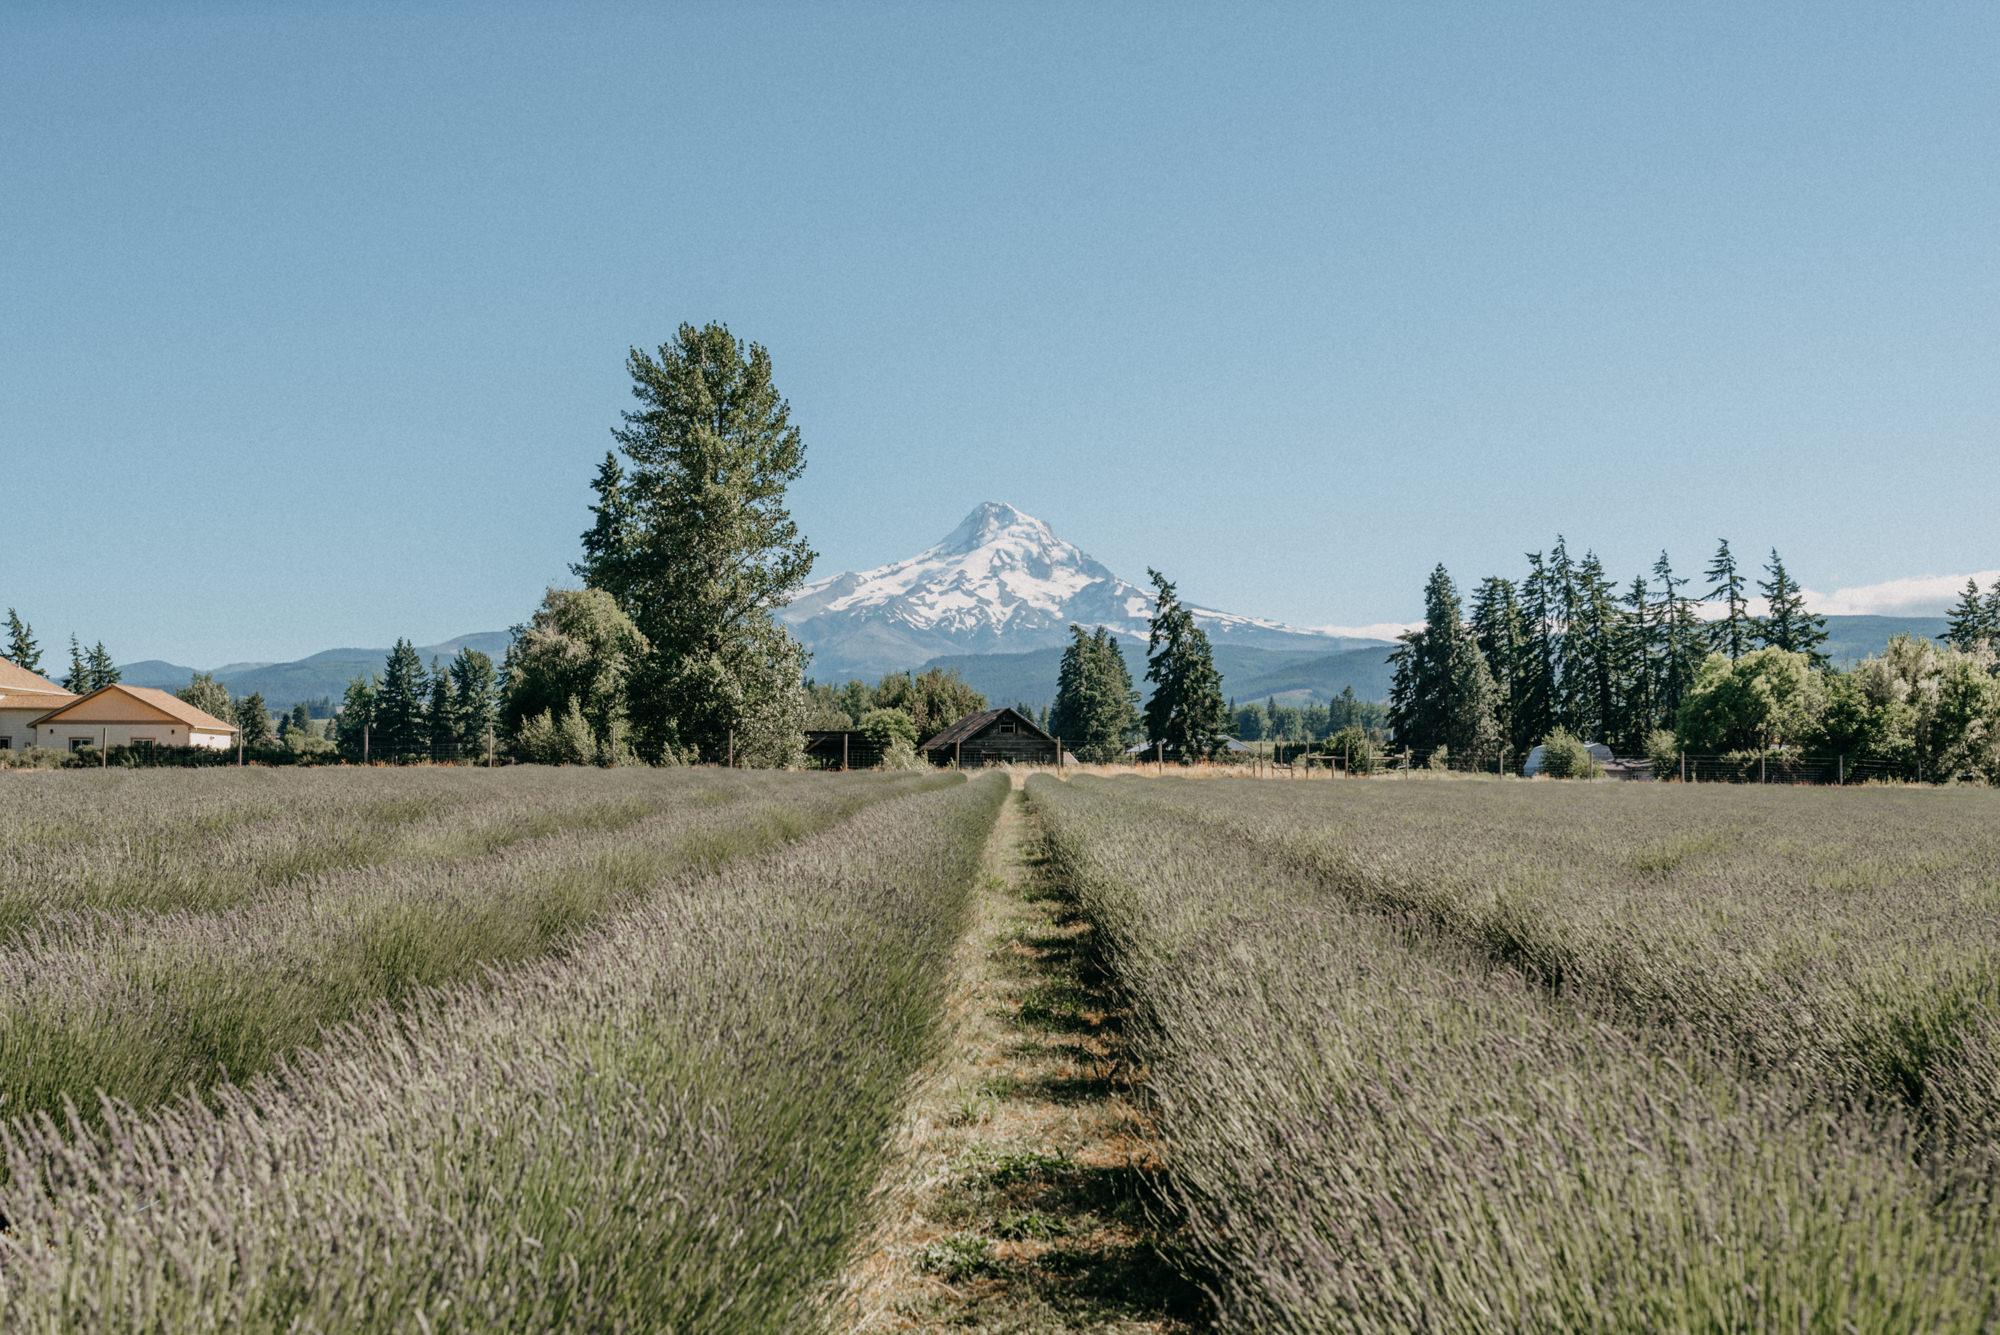 34-Mt-hood-lavender-farms-engagment-couple-summer-7912.jpg